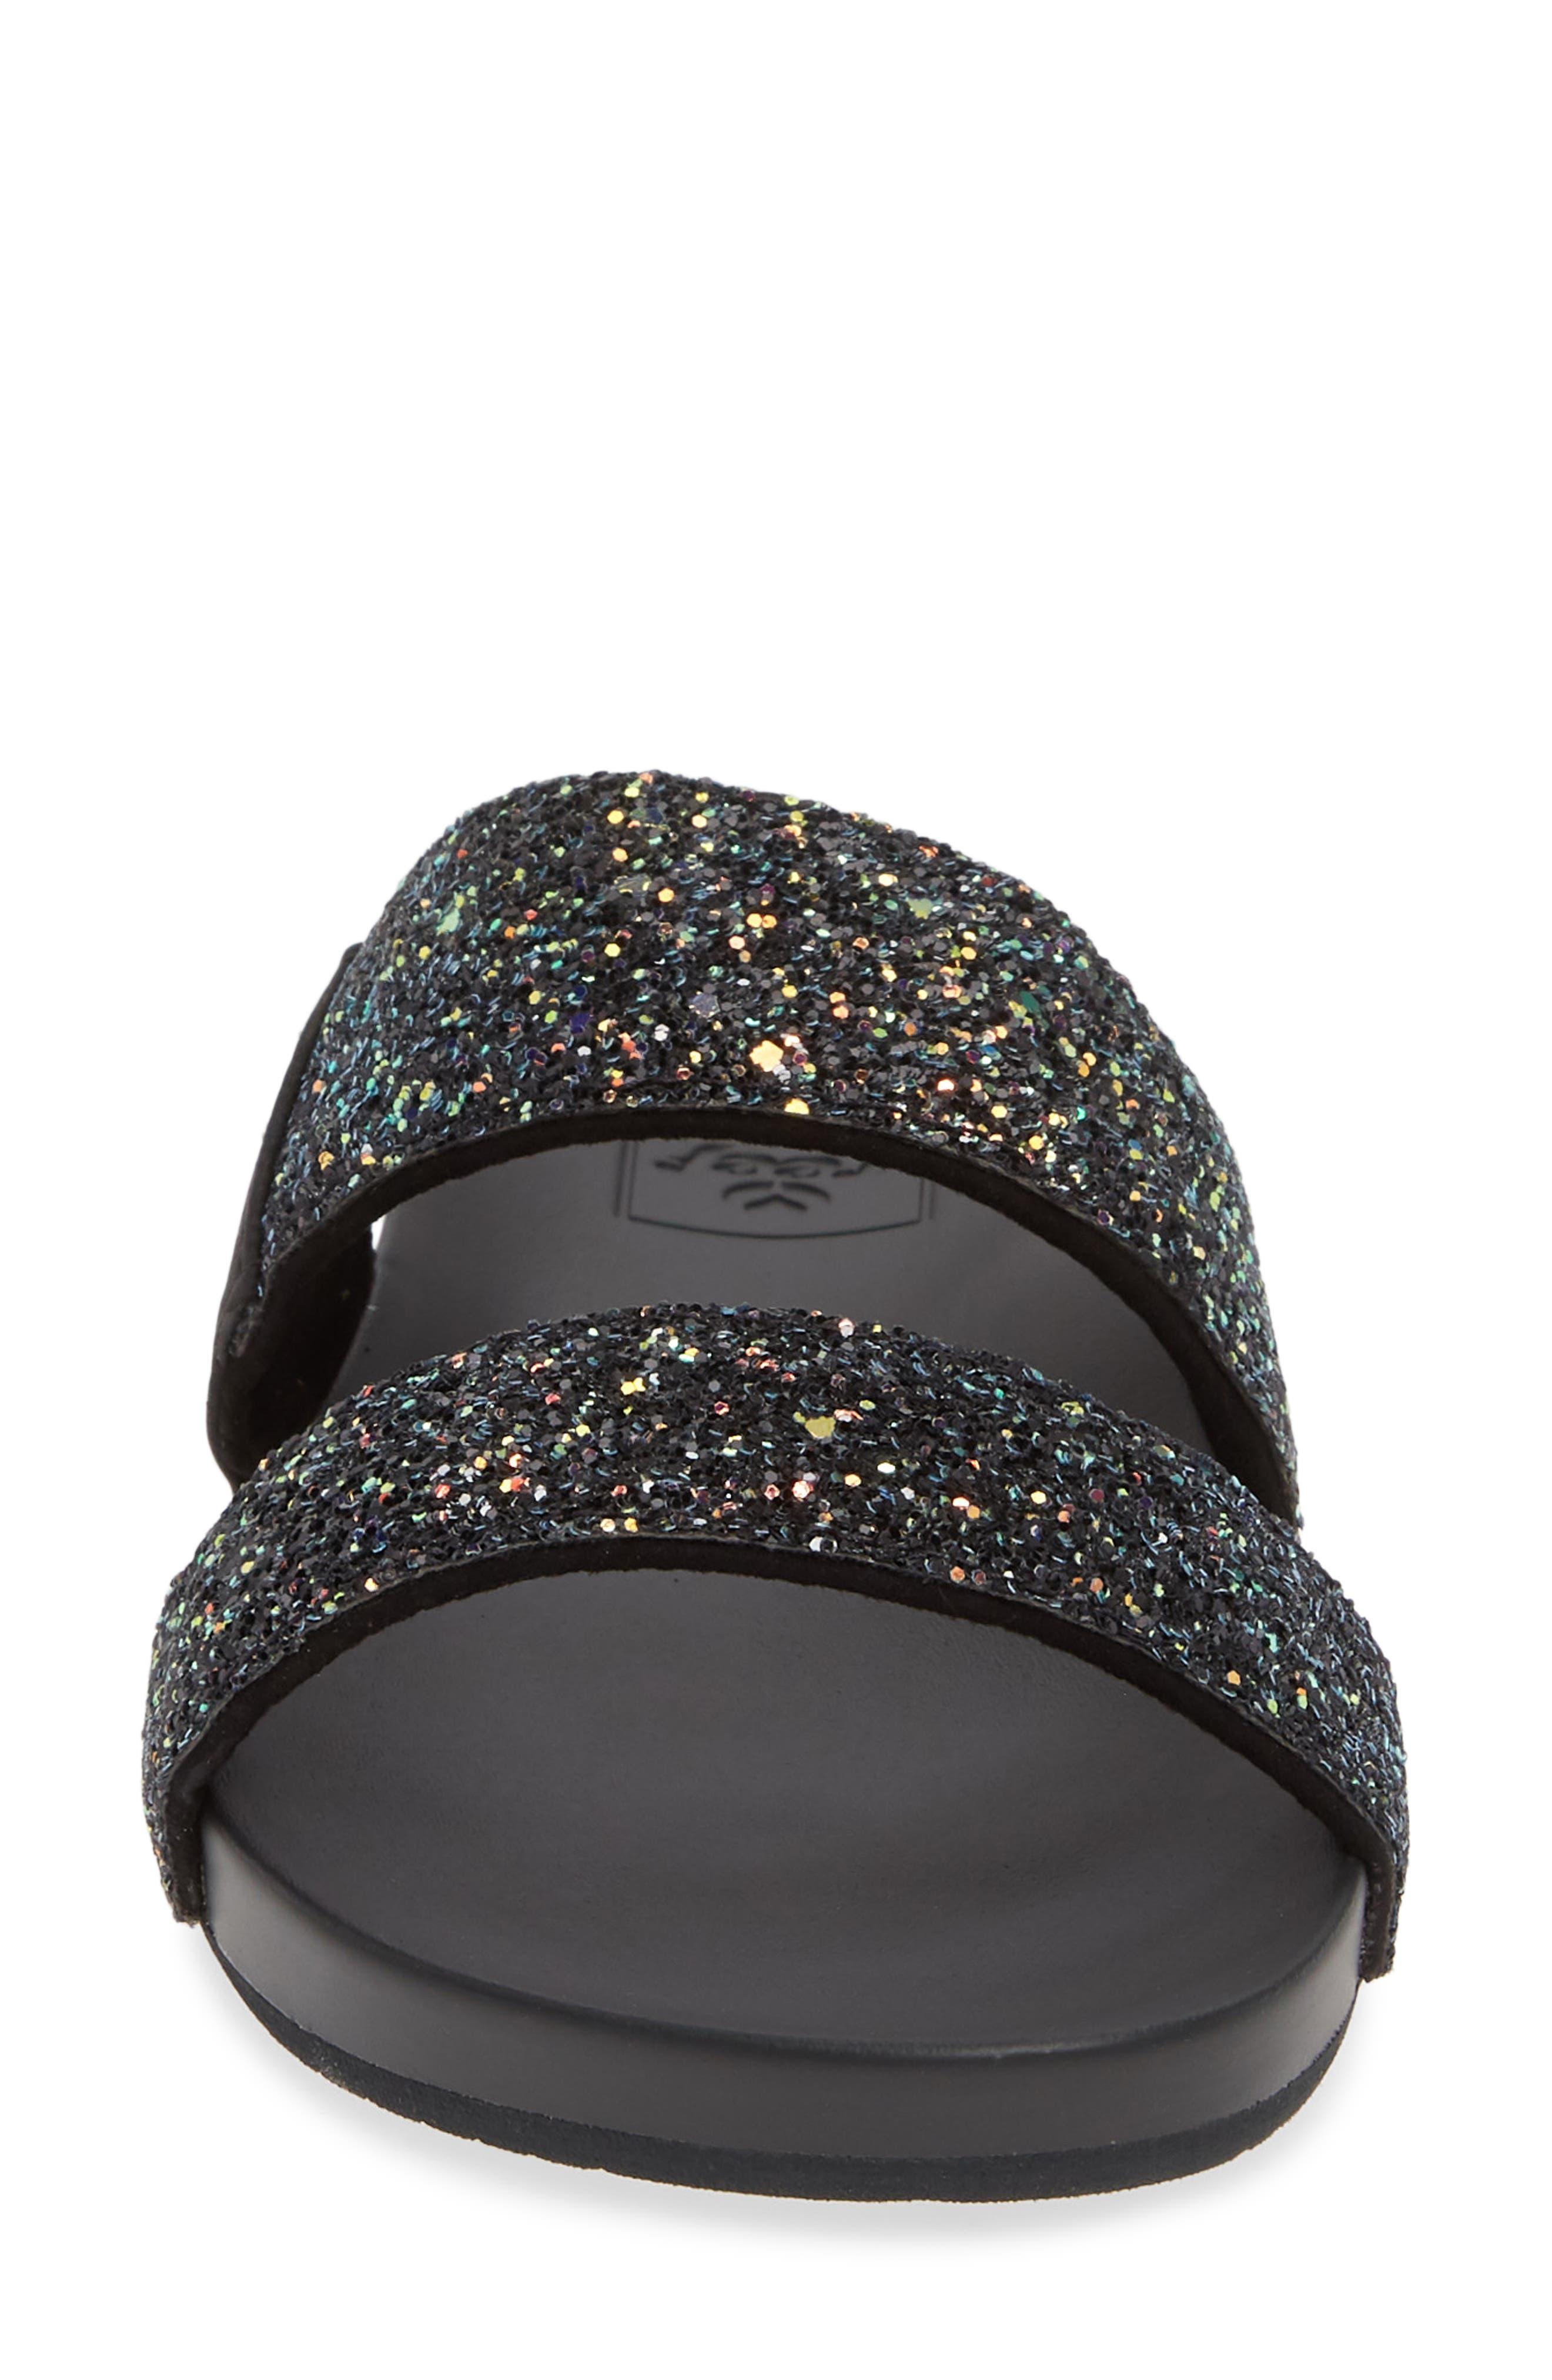 REEF, Cushion Bounce Vista Slide Sandal, Alternate thumbnail 4, color, POP ROCKS